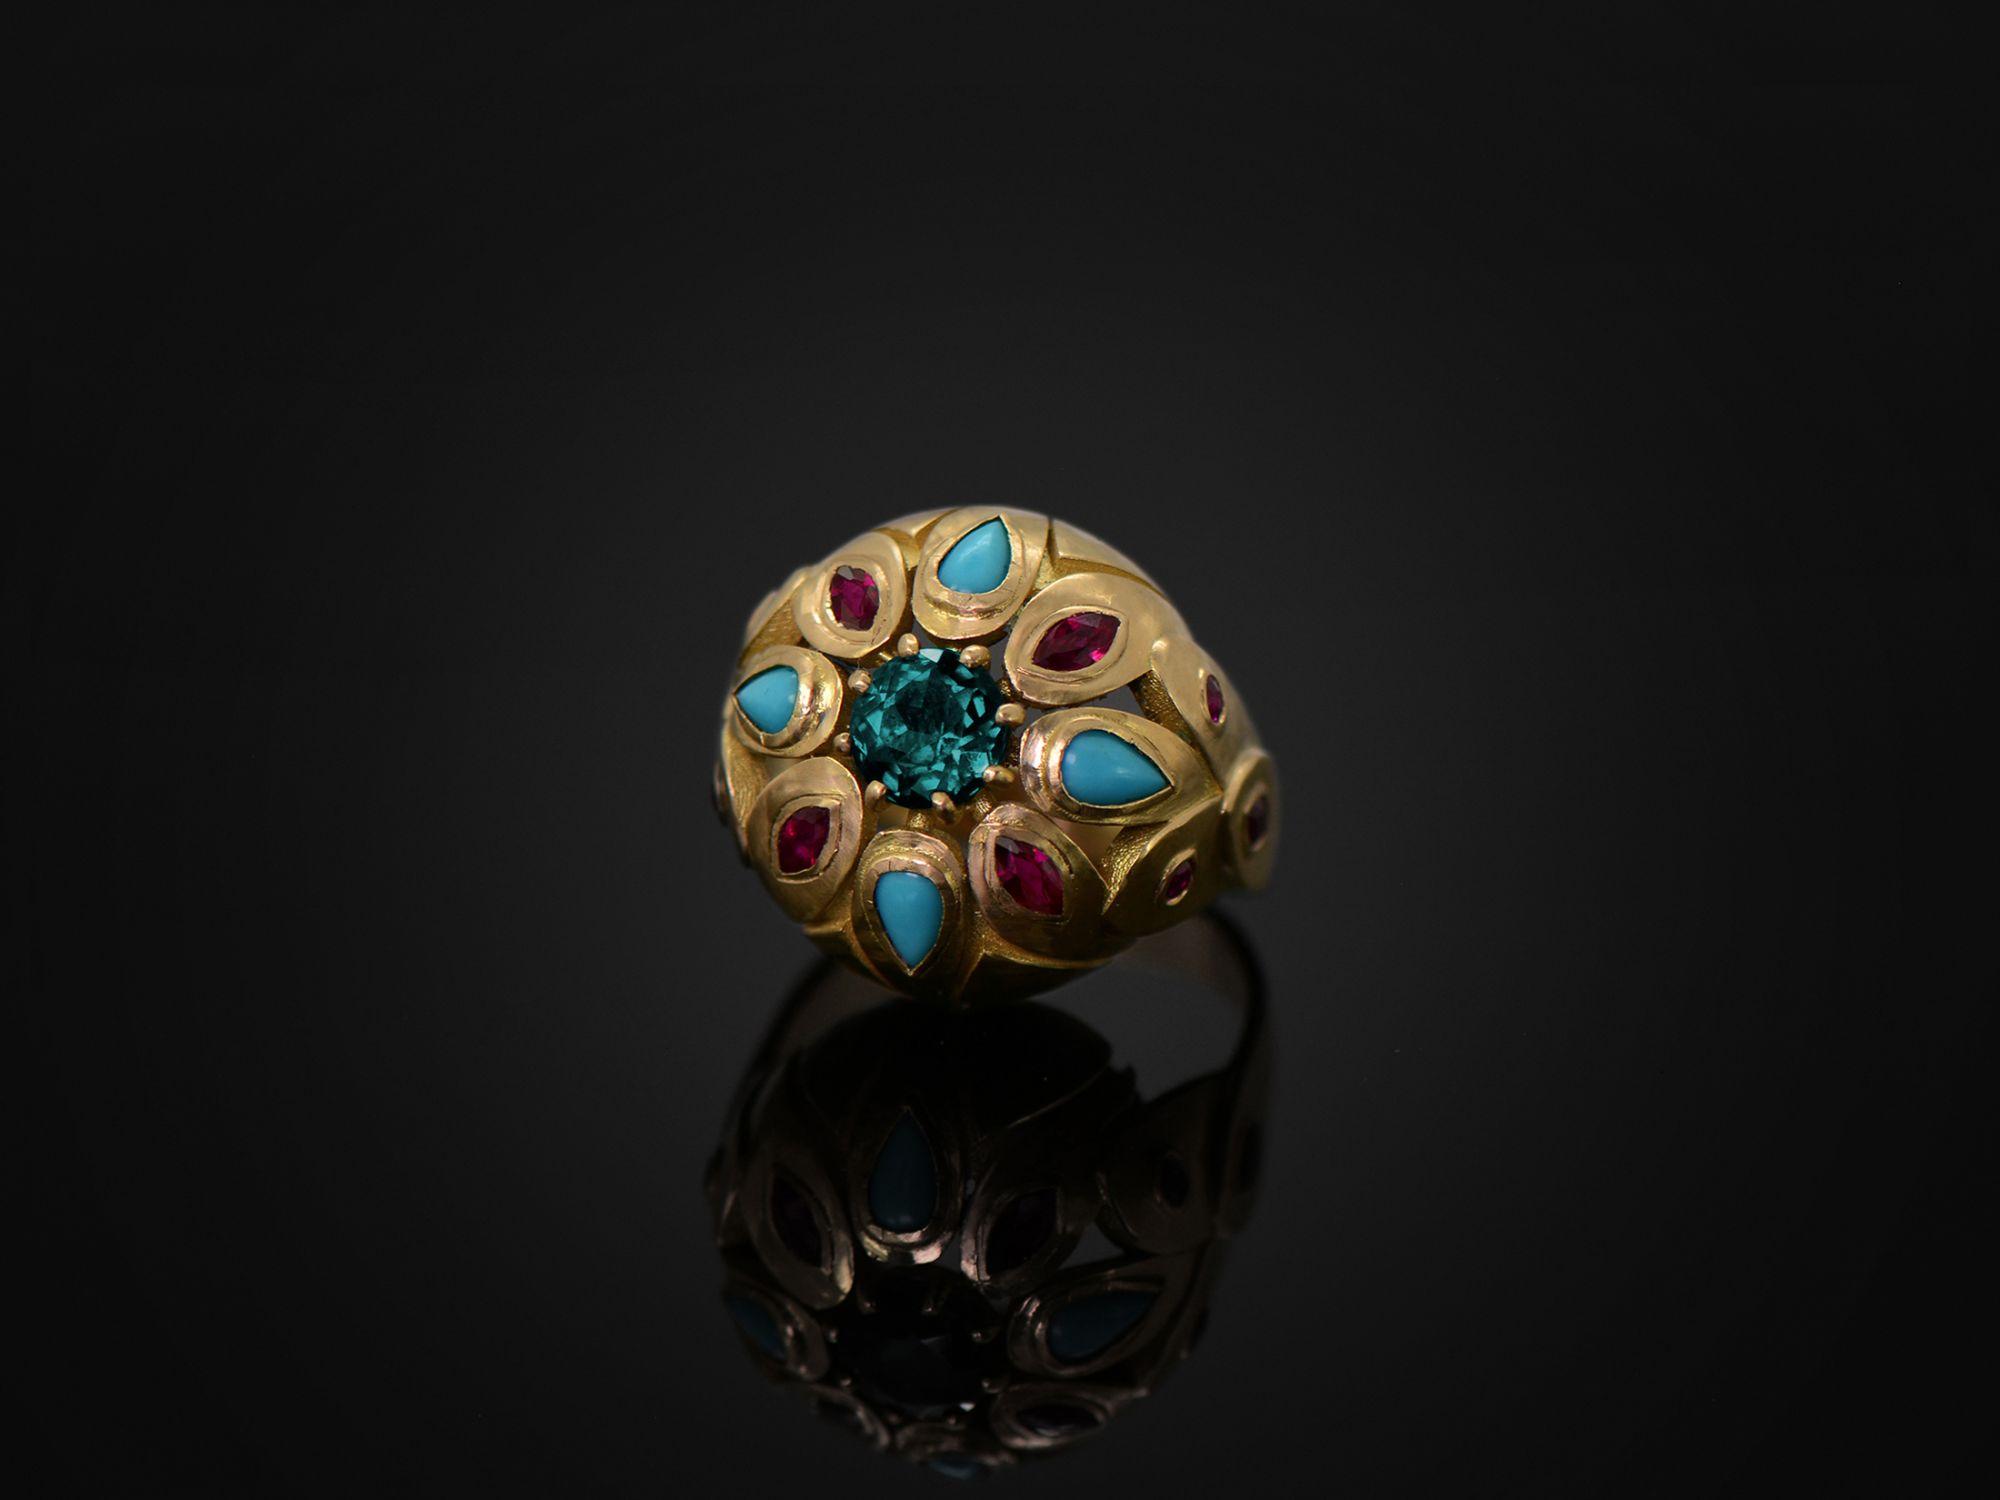 Maja Tourmaline Ring by Emmanuelle Zysman